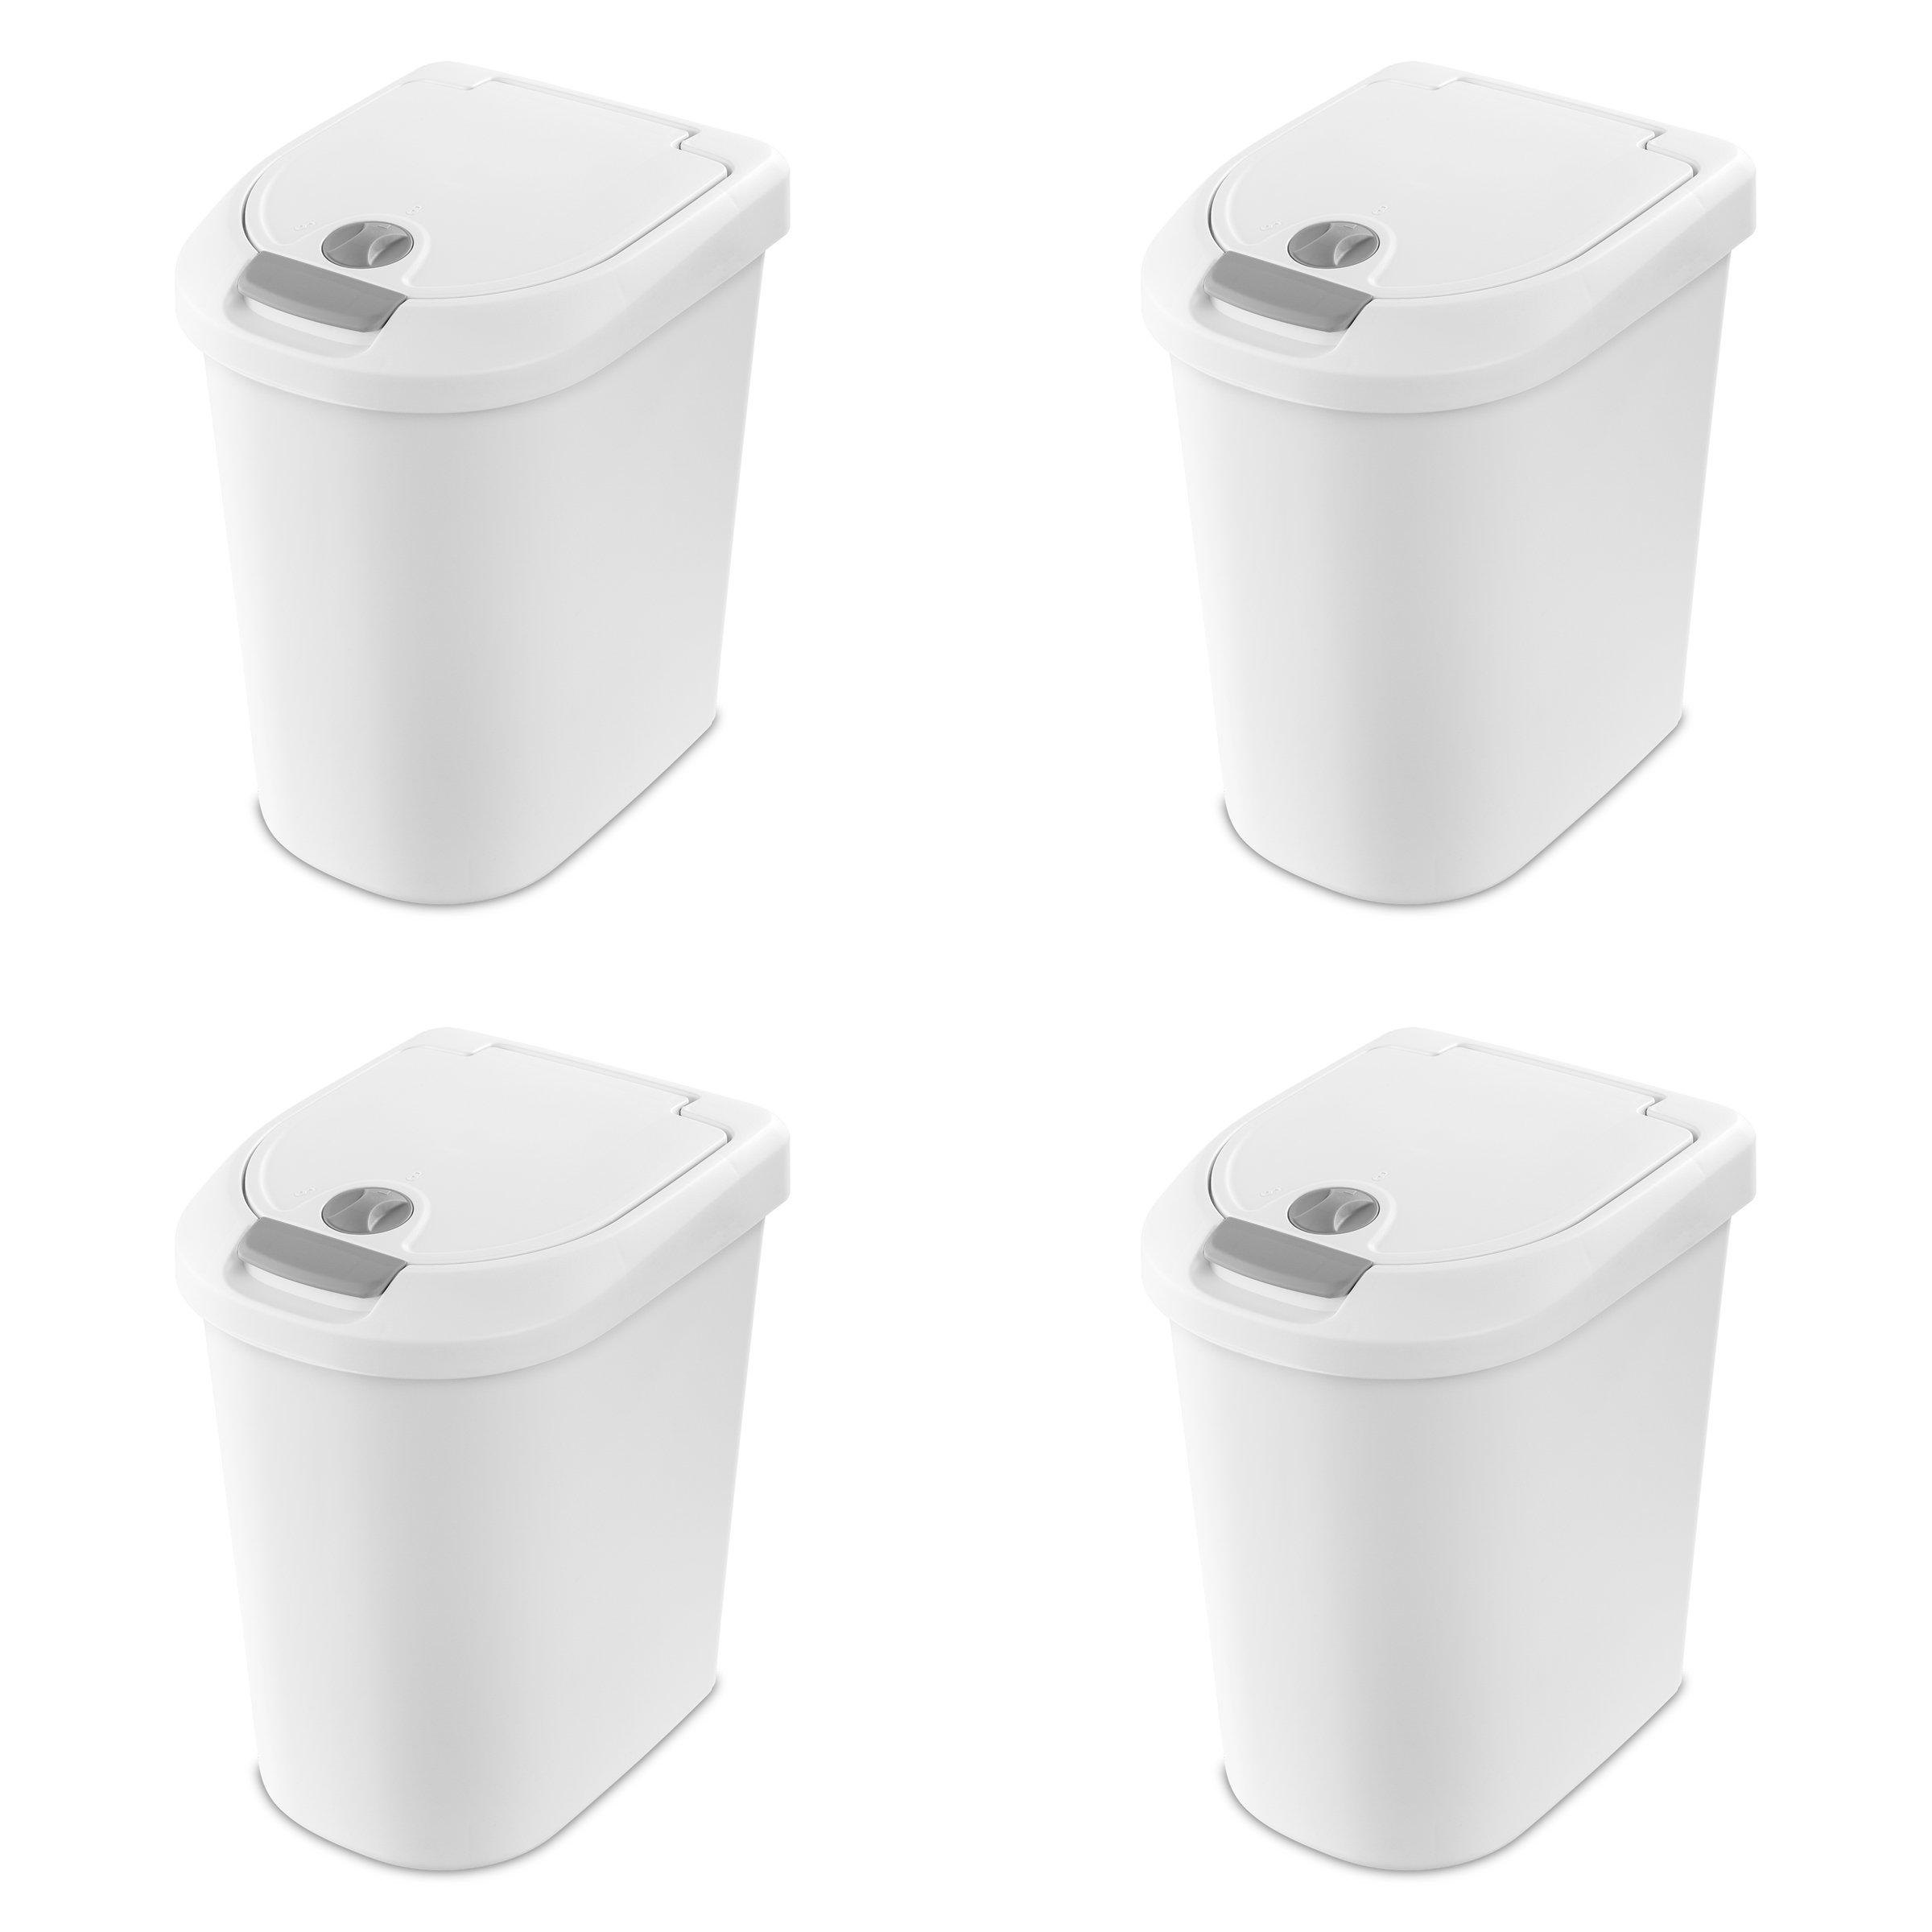 Sterilite 10998004 7.3 Gallon/28 Liter Locking TouchTop Wastebasket, White Lid & Base w/ Titanium Latch & Lock, 4-Pack